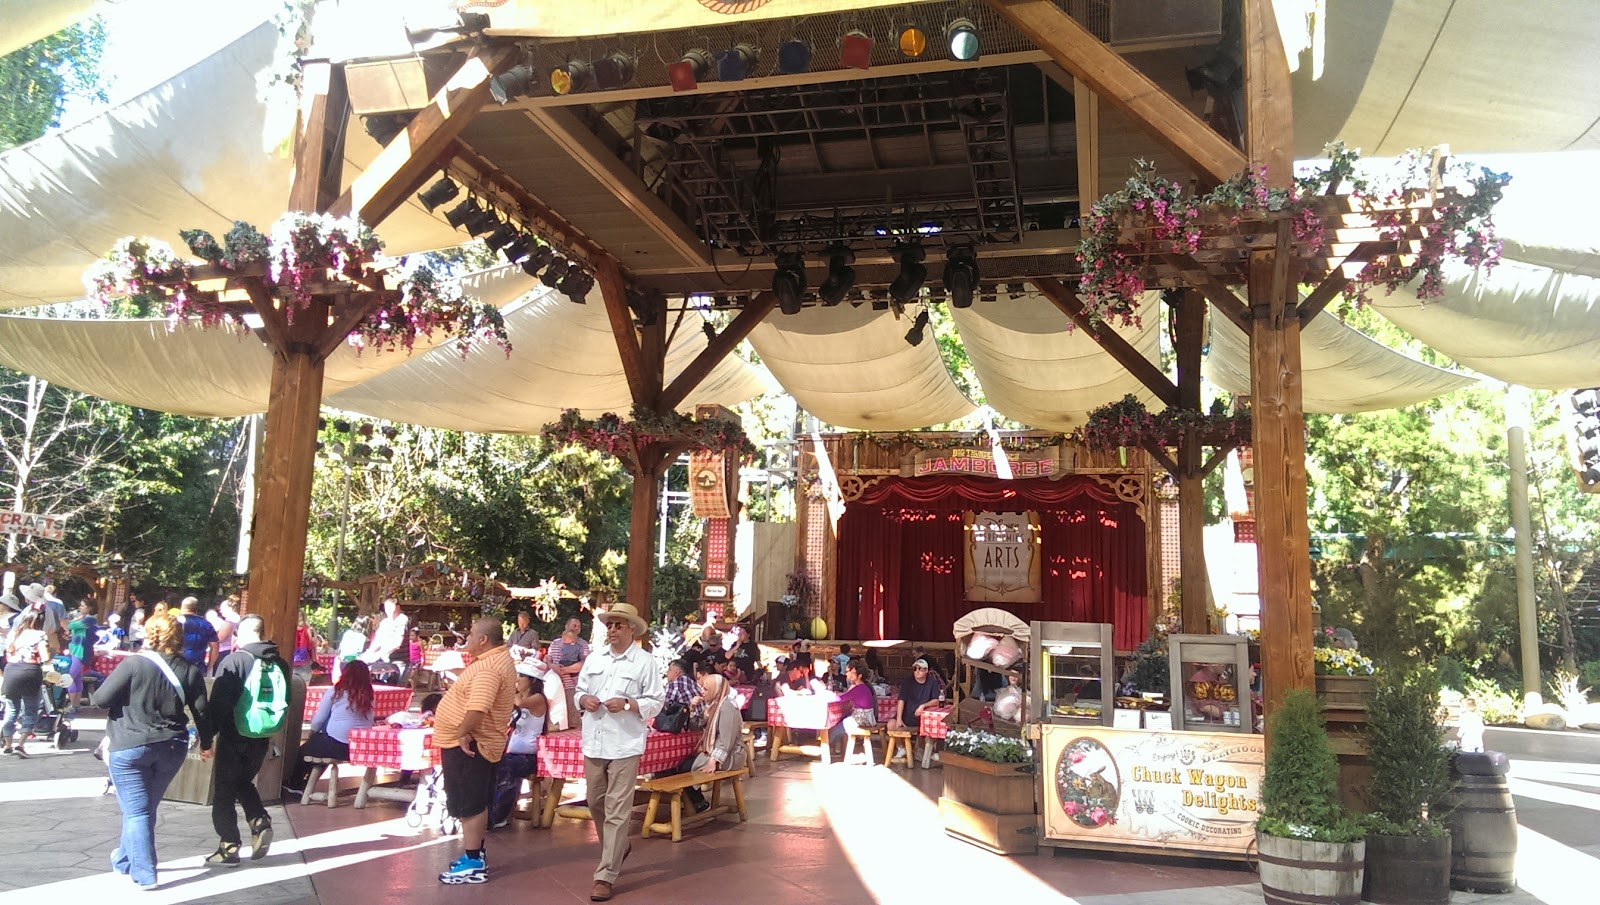 Springtime Roundup at Disneyland's Big Thunder Ranch